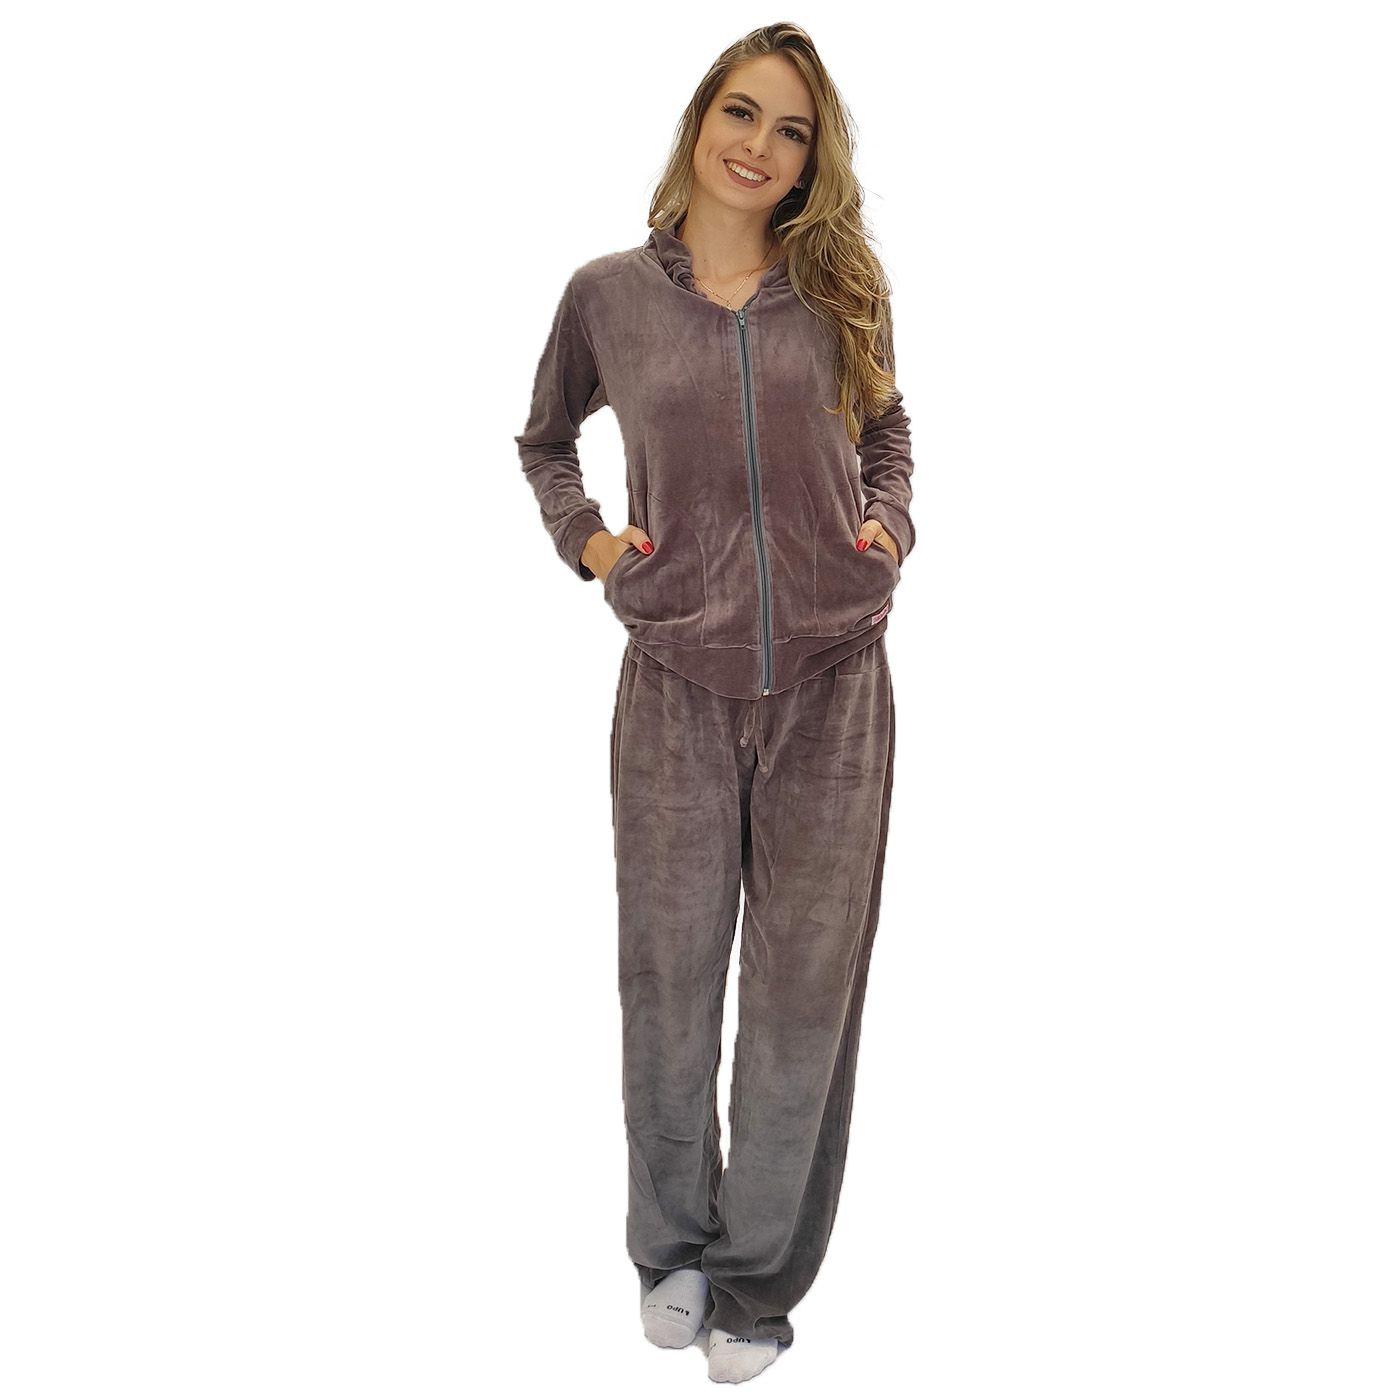 Pijama abrigo feminino plush ziper sem capuz